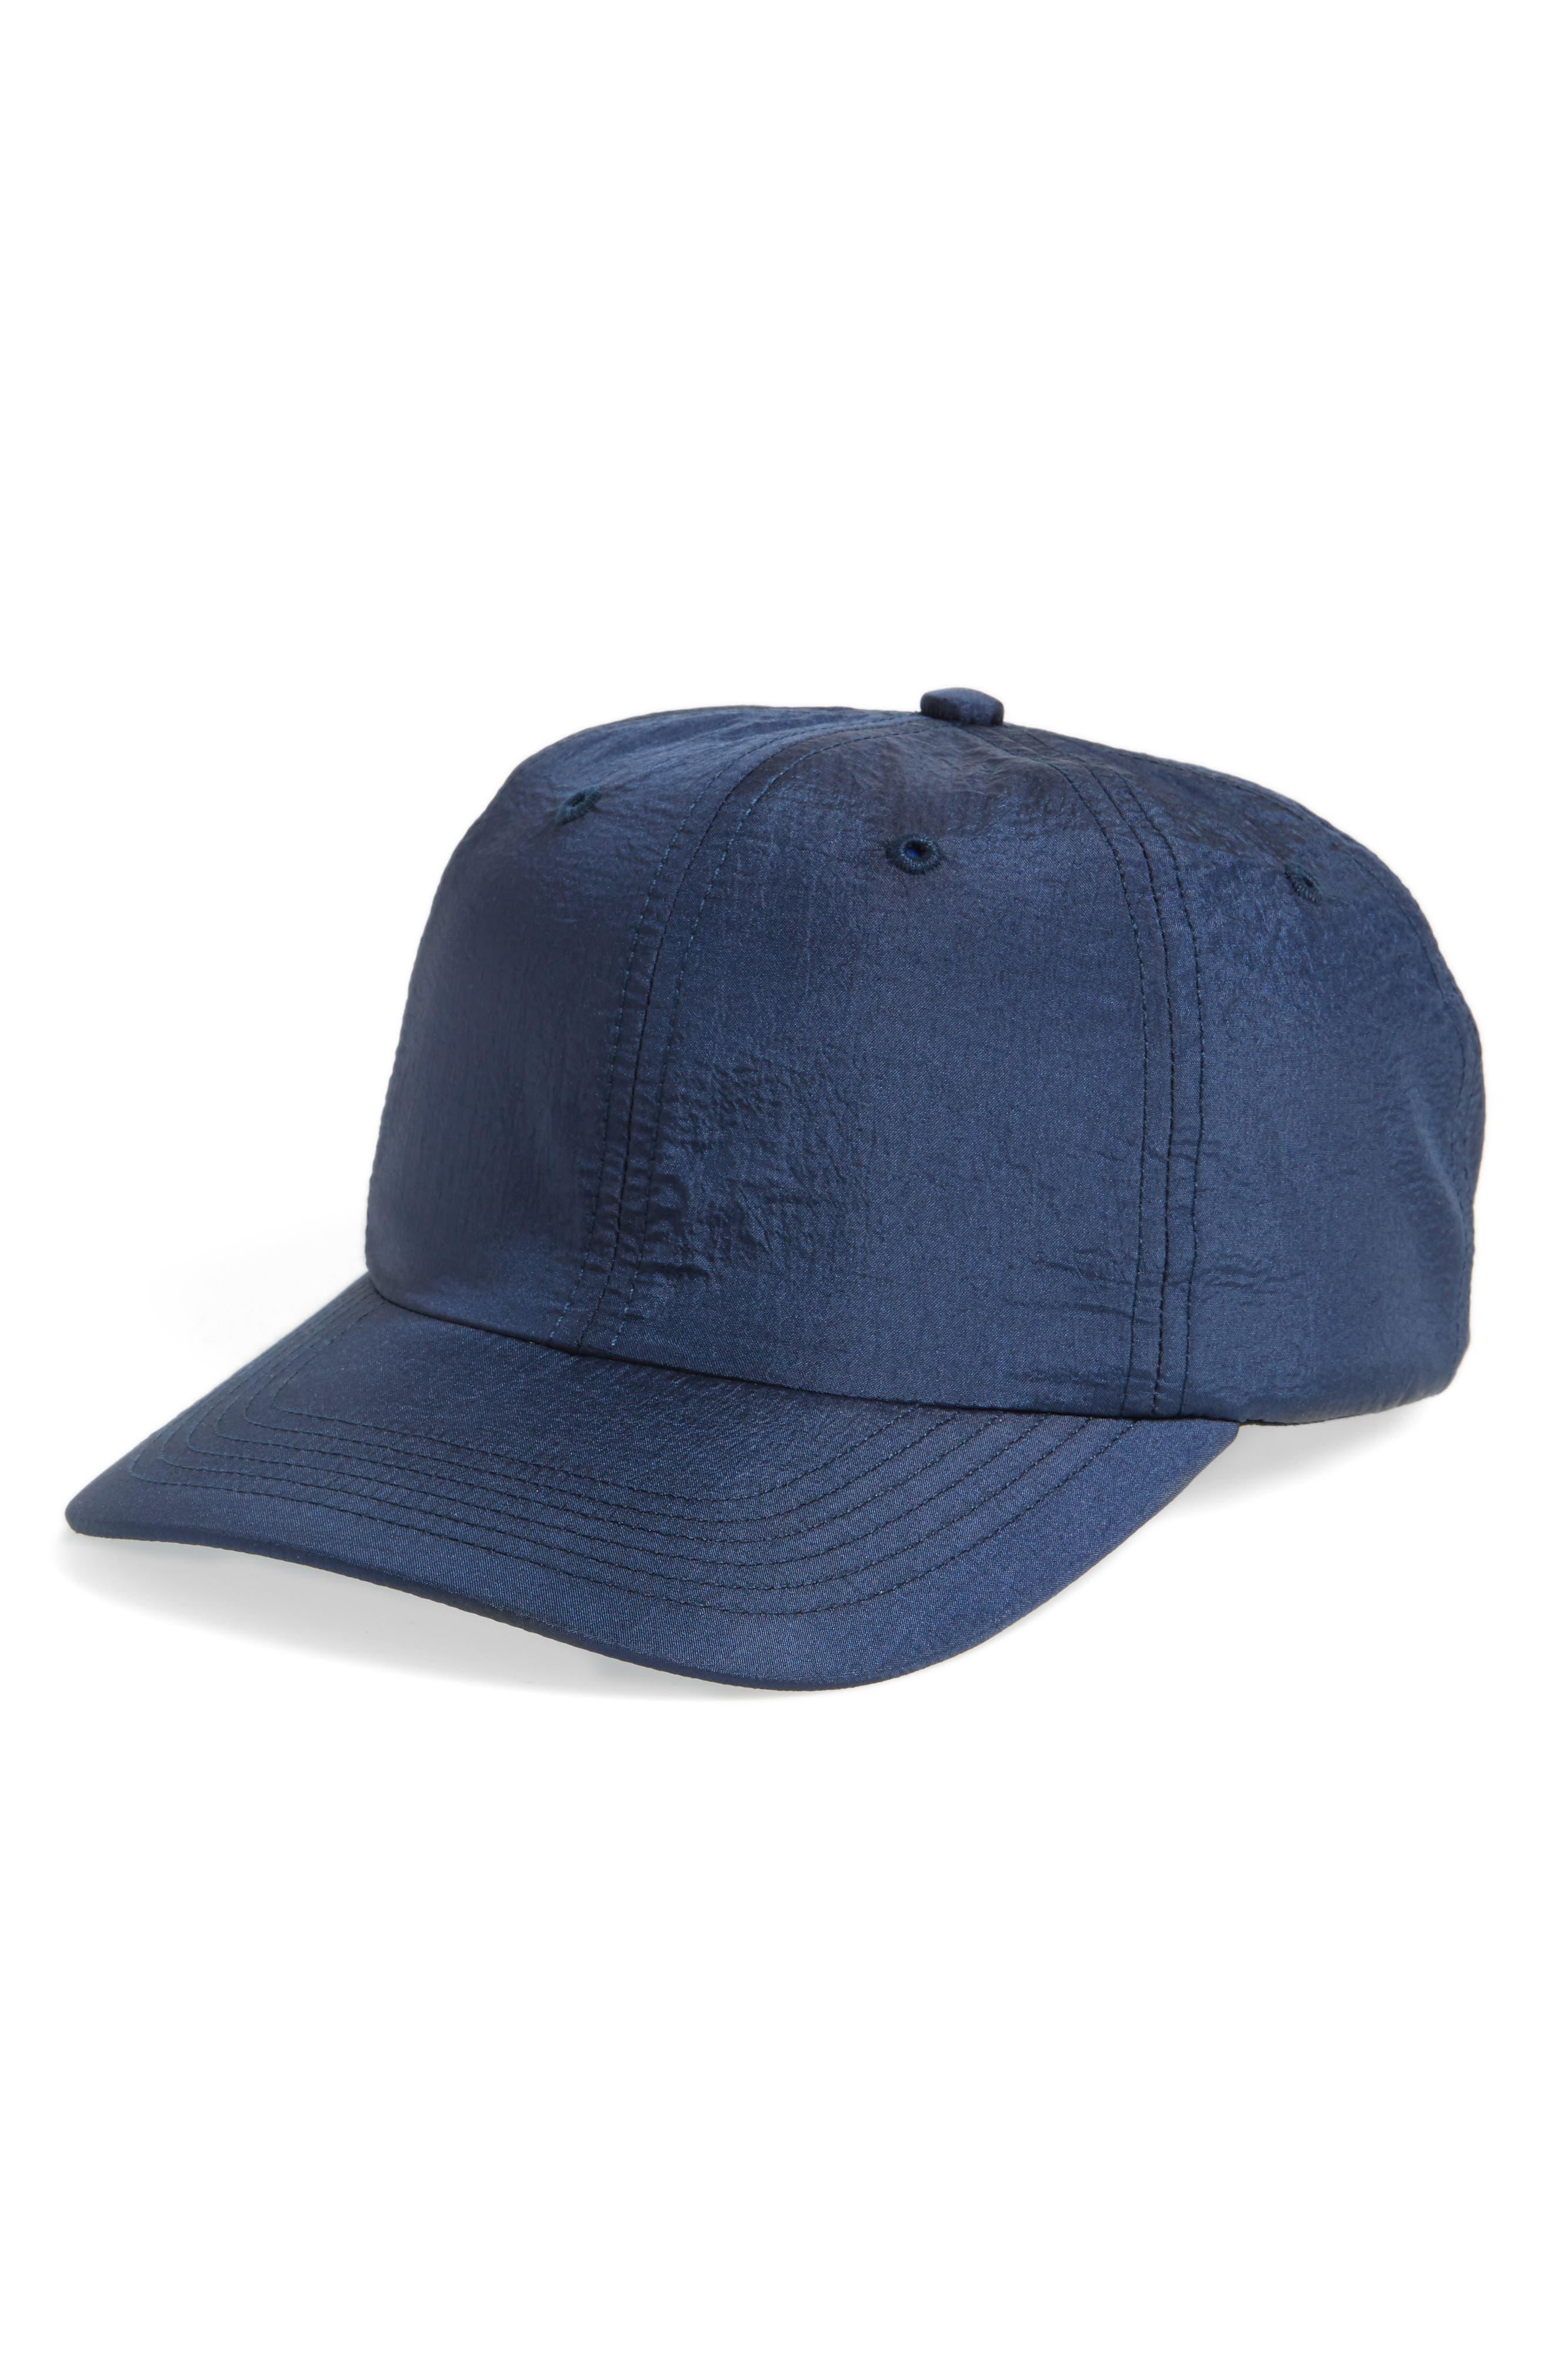 Nylon Ball Cap,                         Main,                         color, Navy